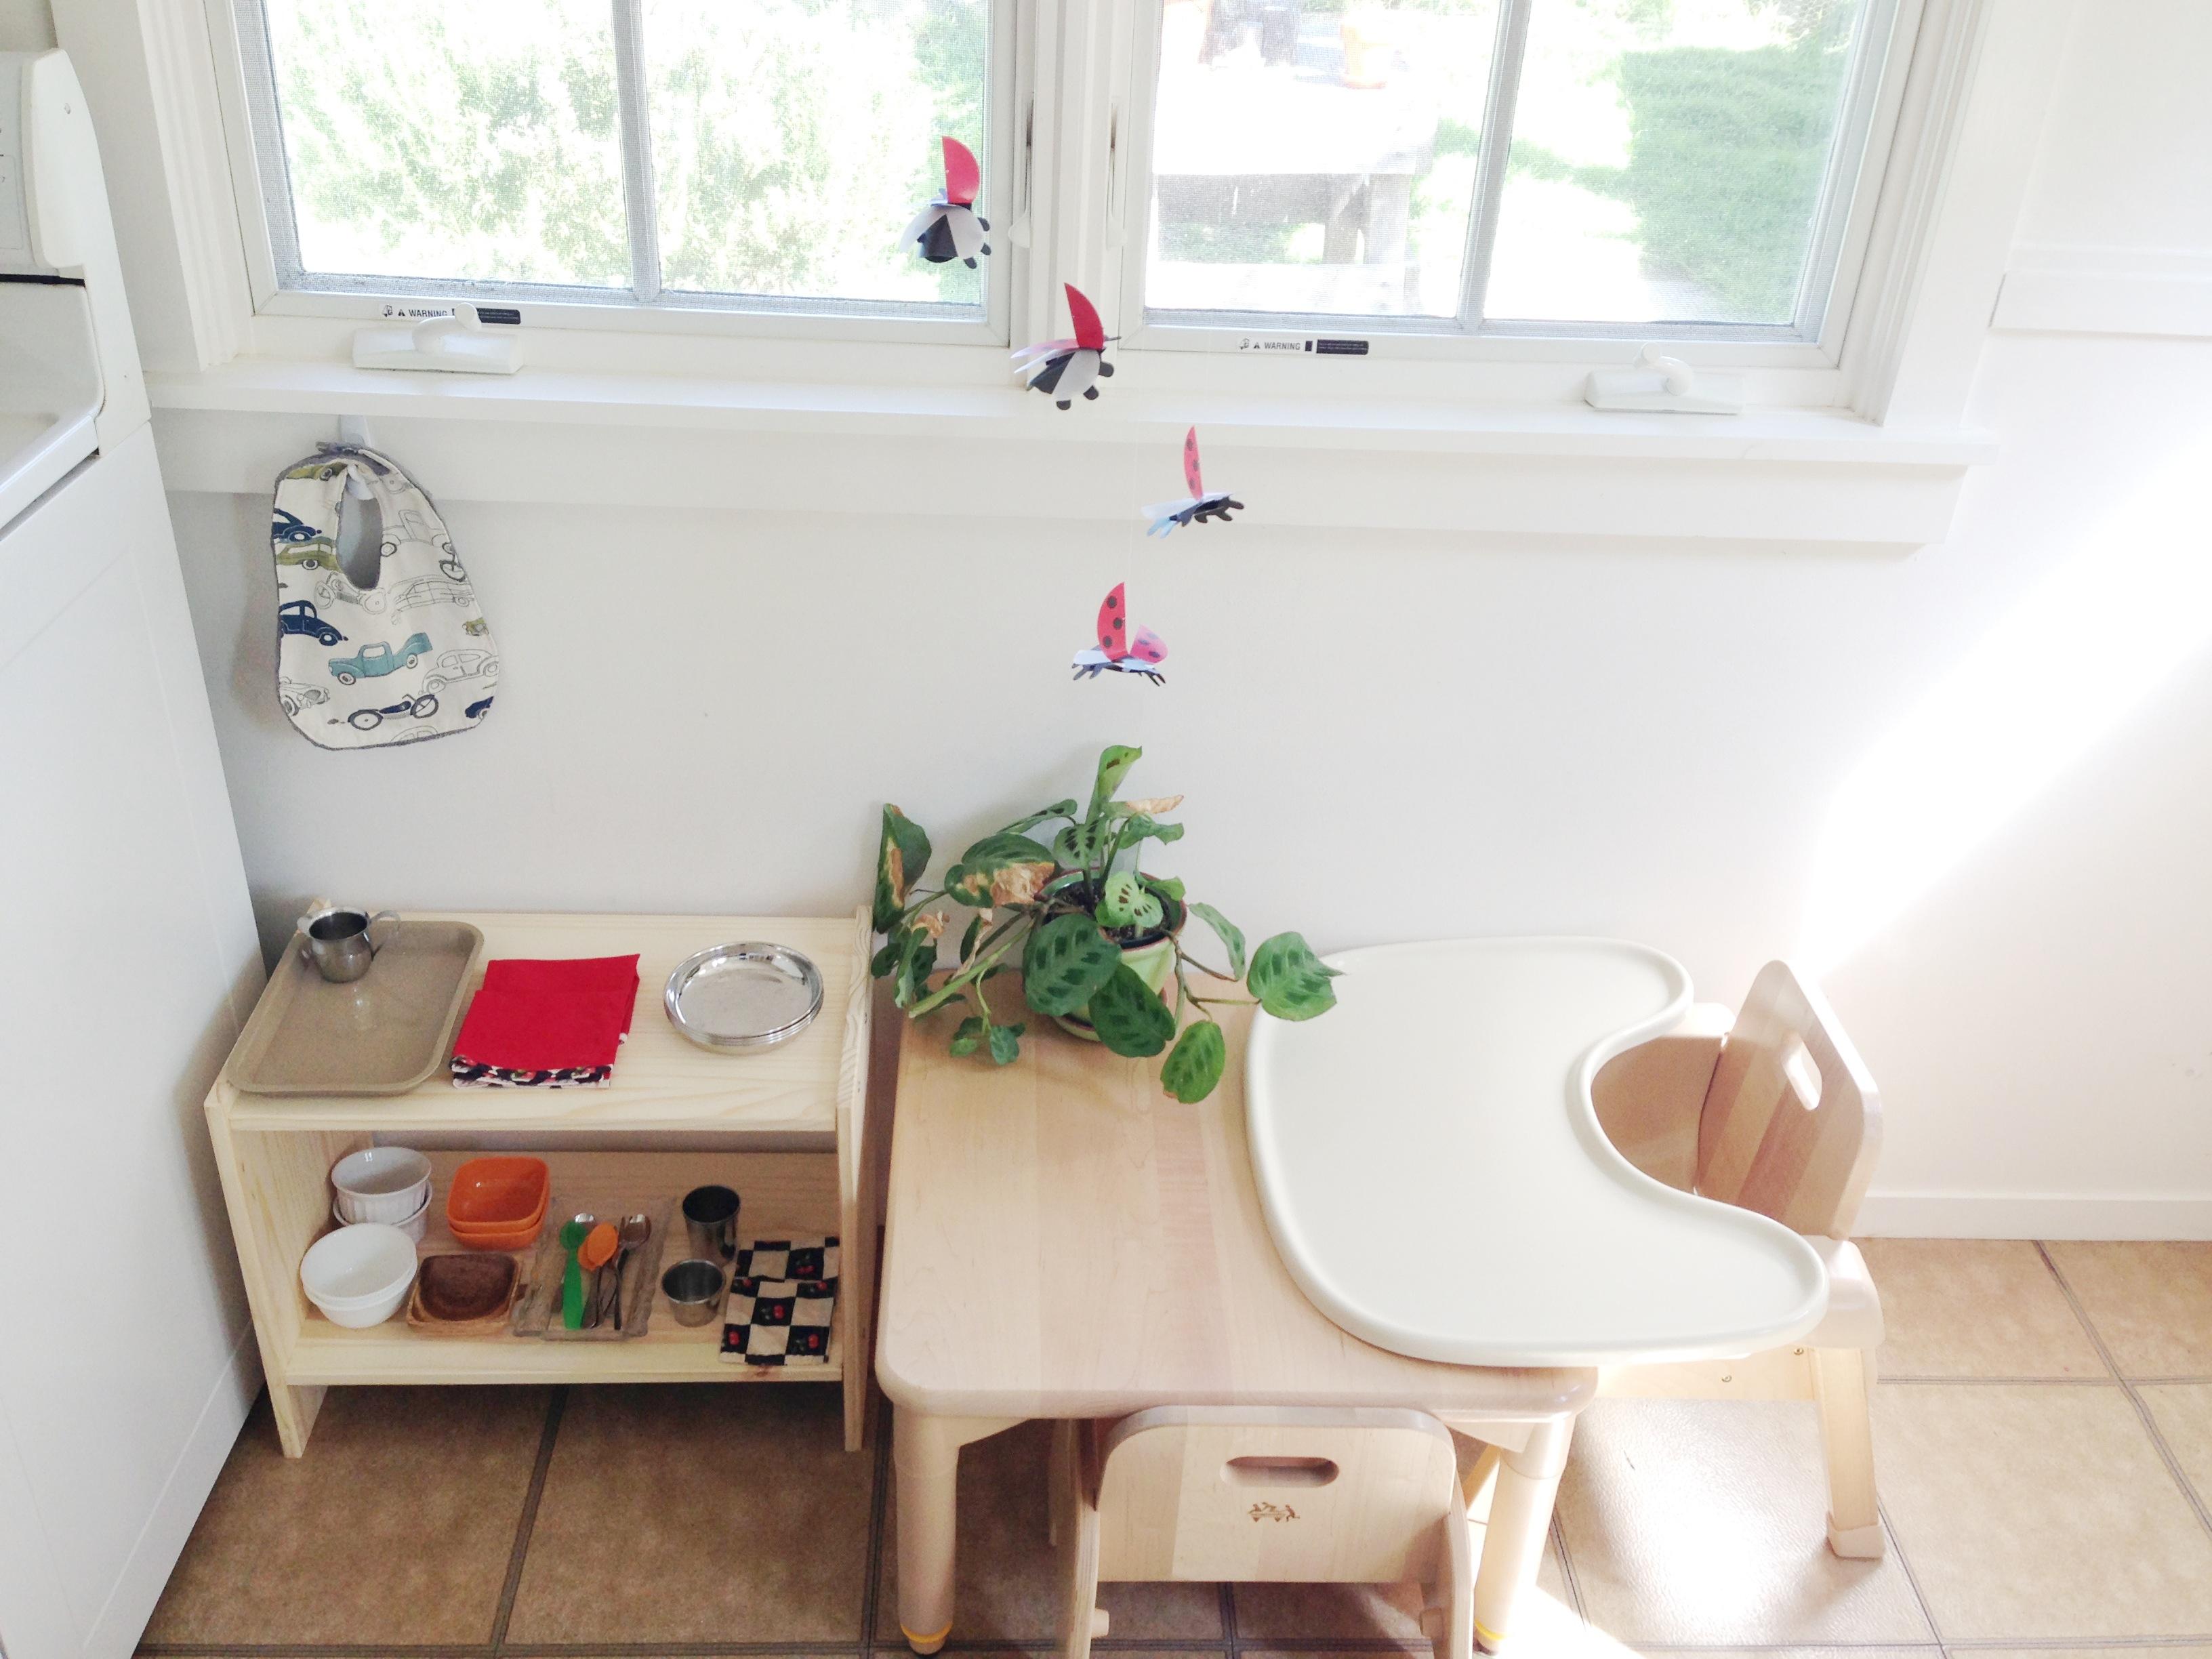 Montessori in the home | Healthy Beginnings Montessori